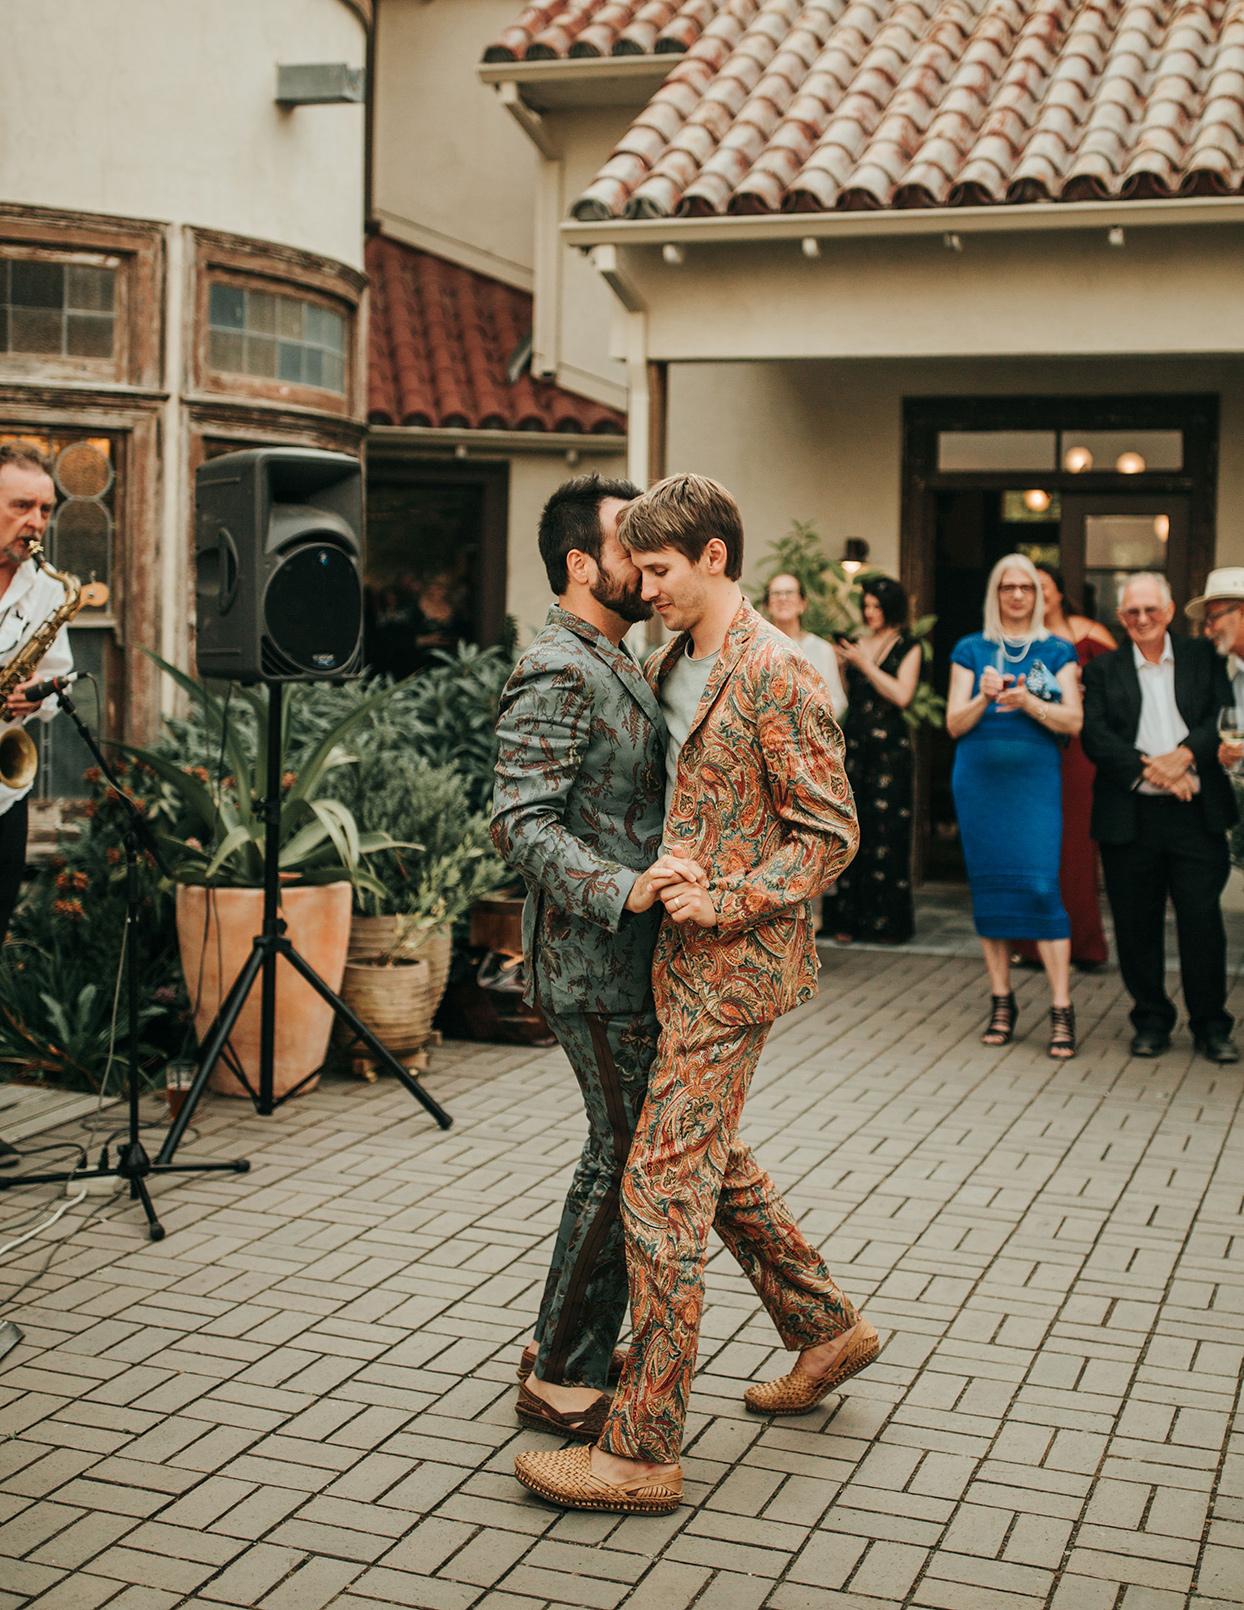 austin alex wedding dance on winery patio